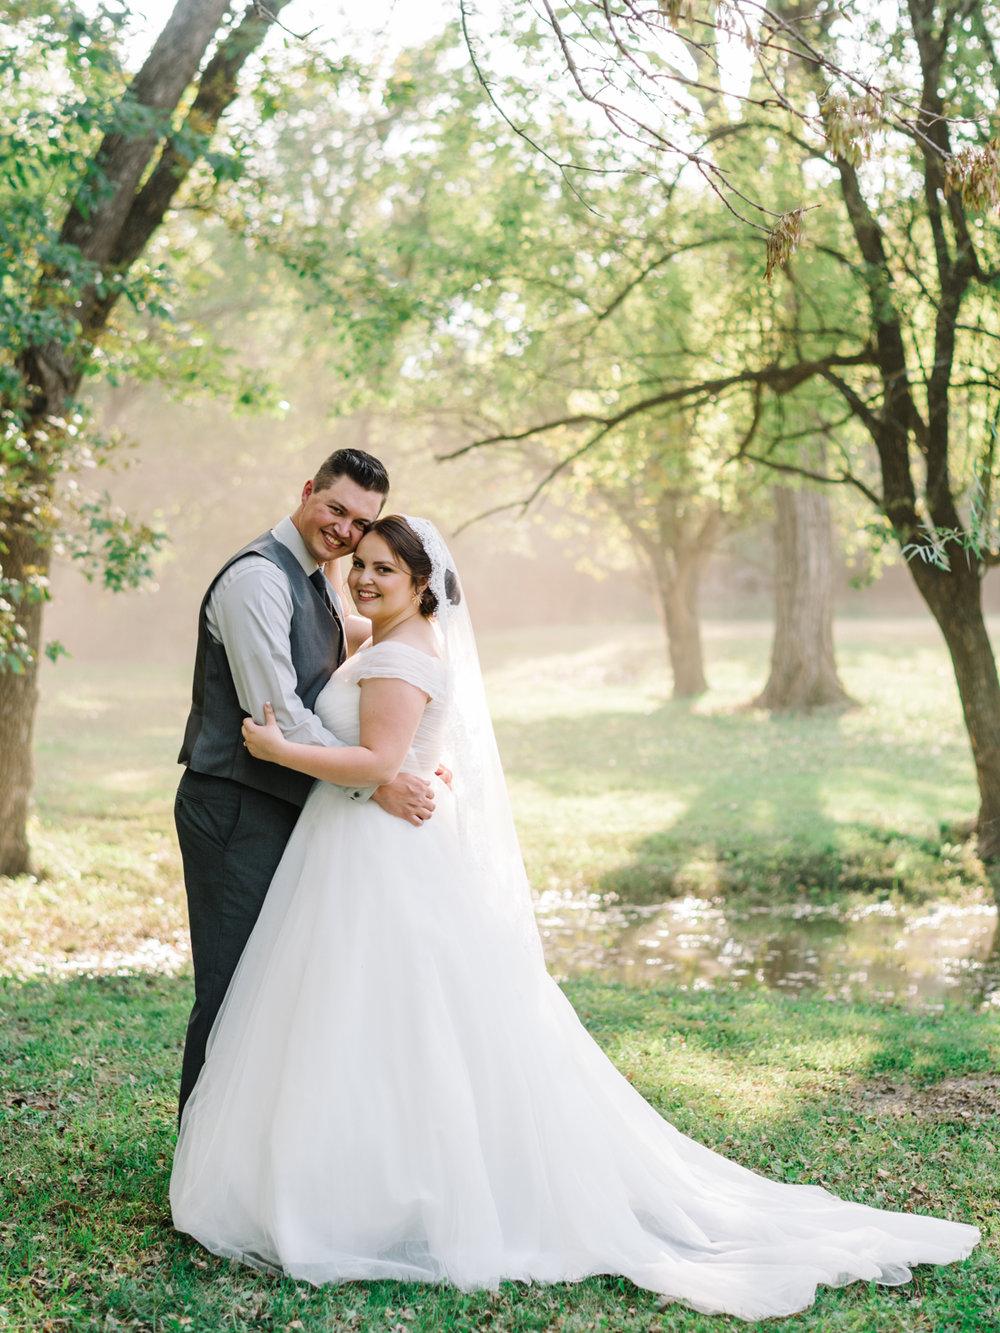 Wichita, Kansas Outdoor Wedding-Neal Dieker-Pinecrest Country Place-Wichita, Kansas Wedding Photographer-186.jpg